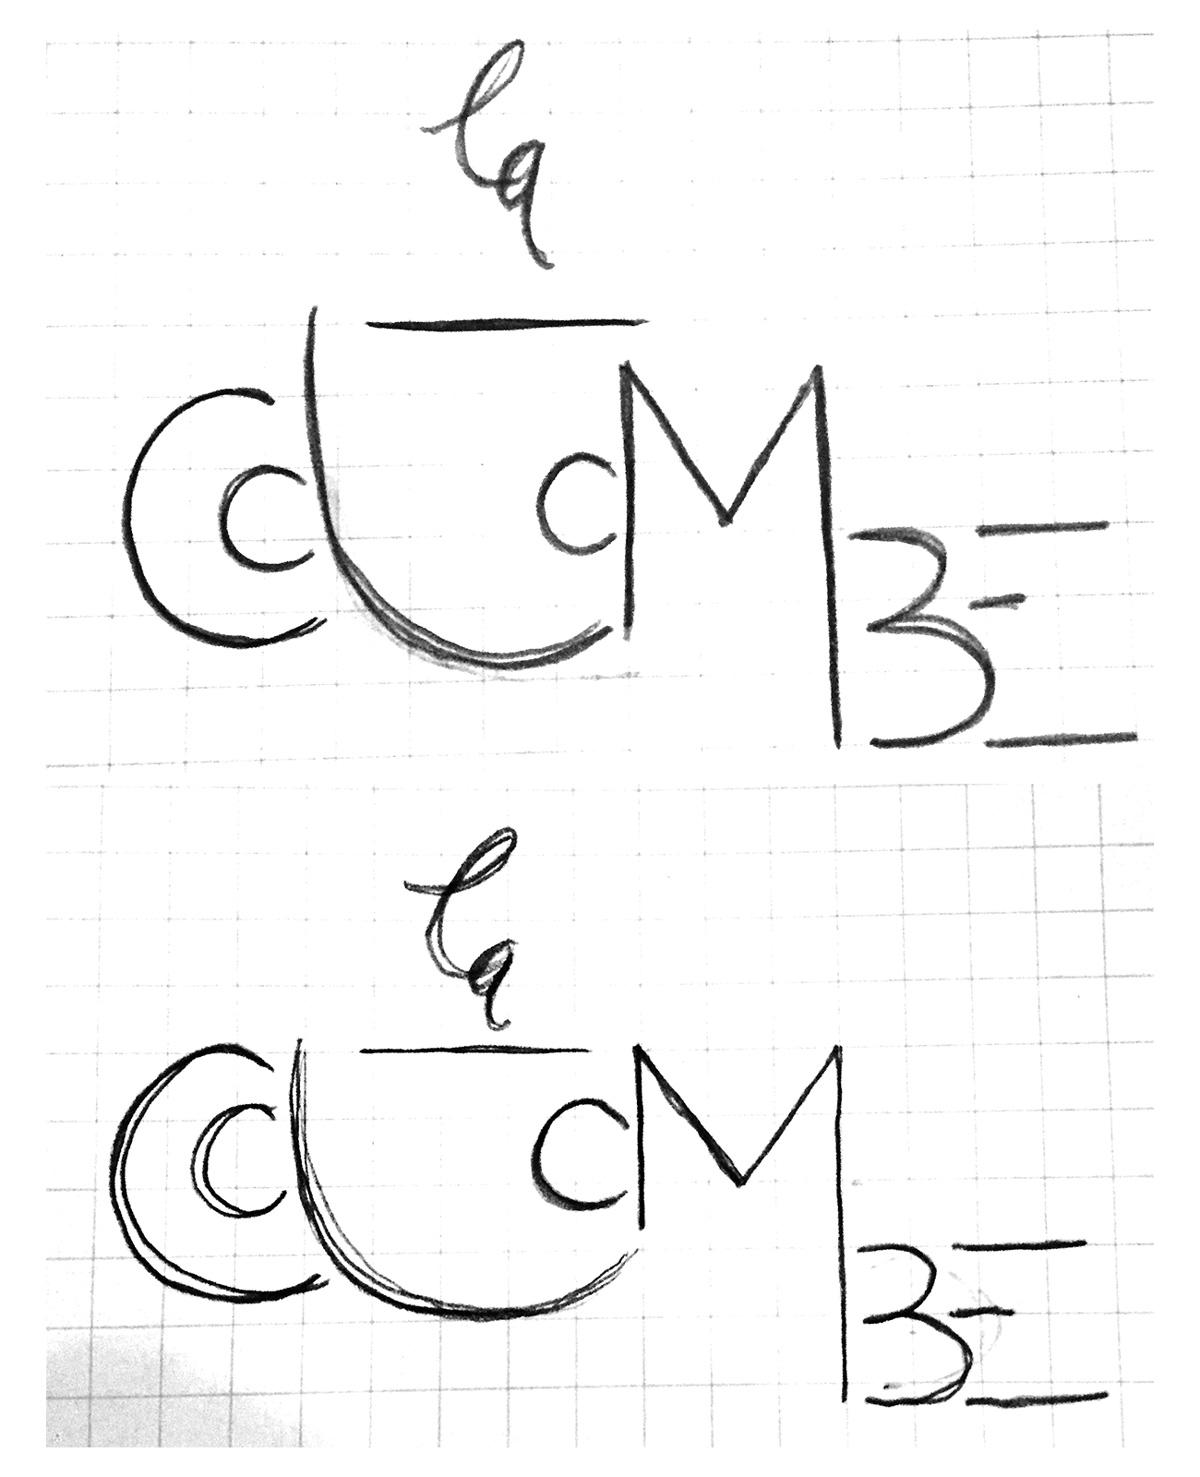 la_colombe_drawing_sketch